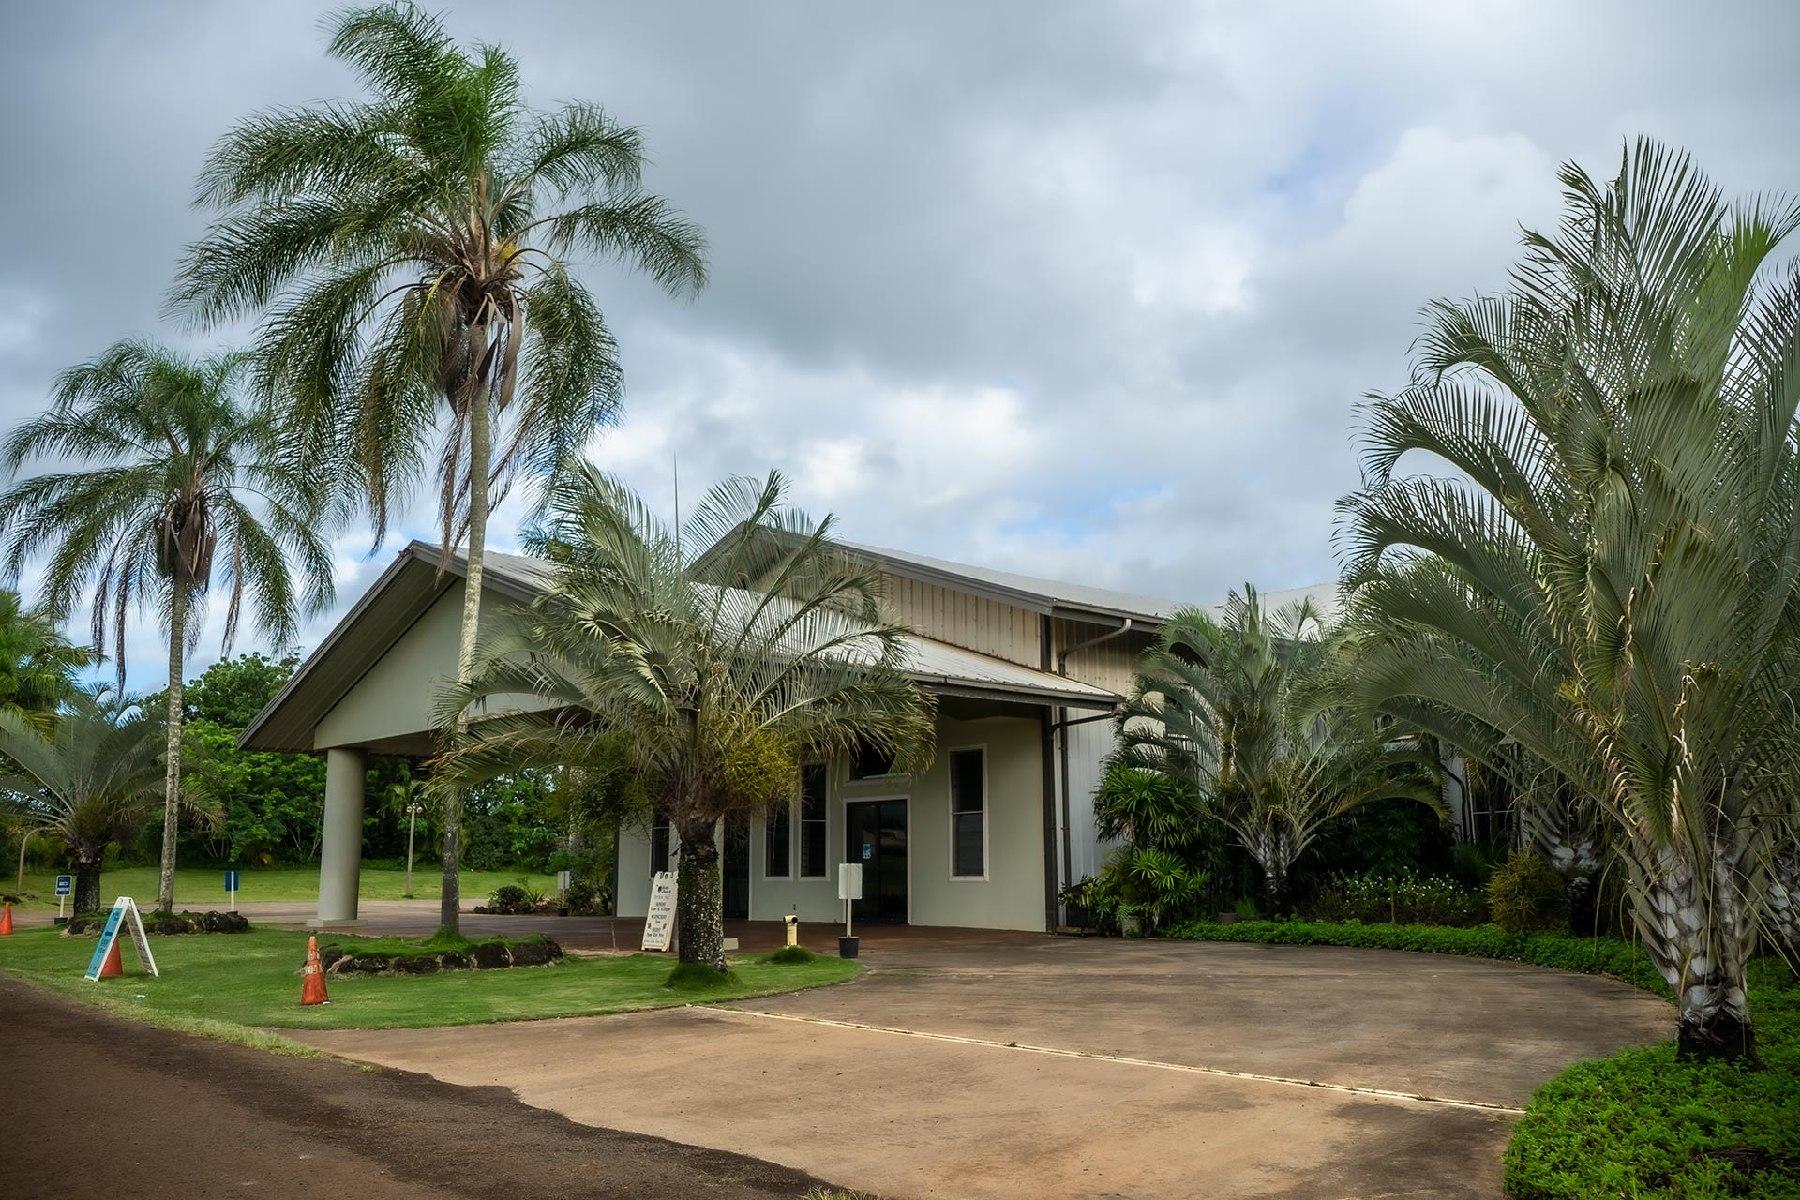 Aloha Church Food Pantry